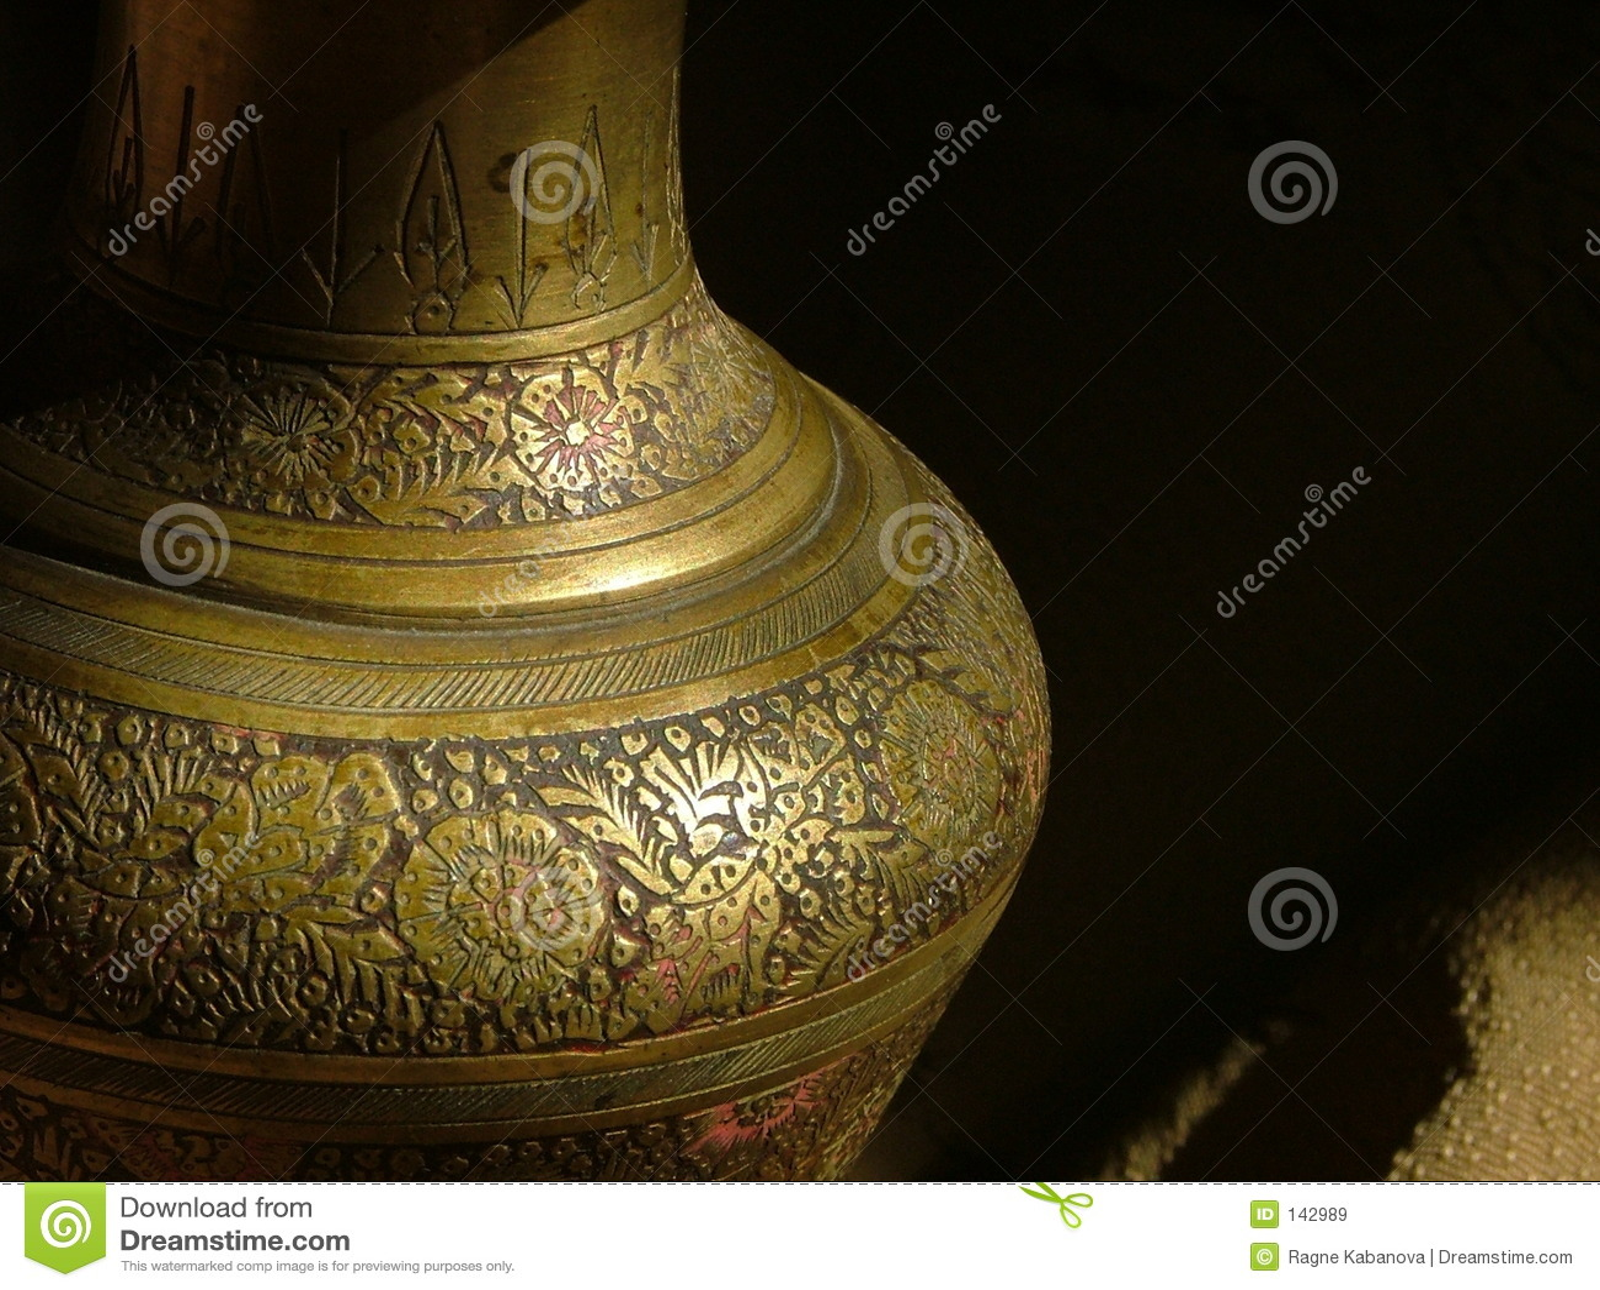 Vase artistique